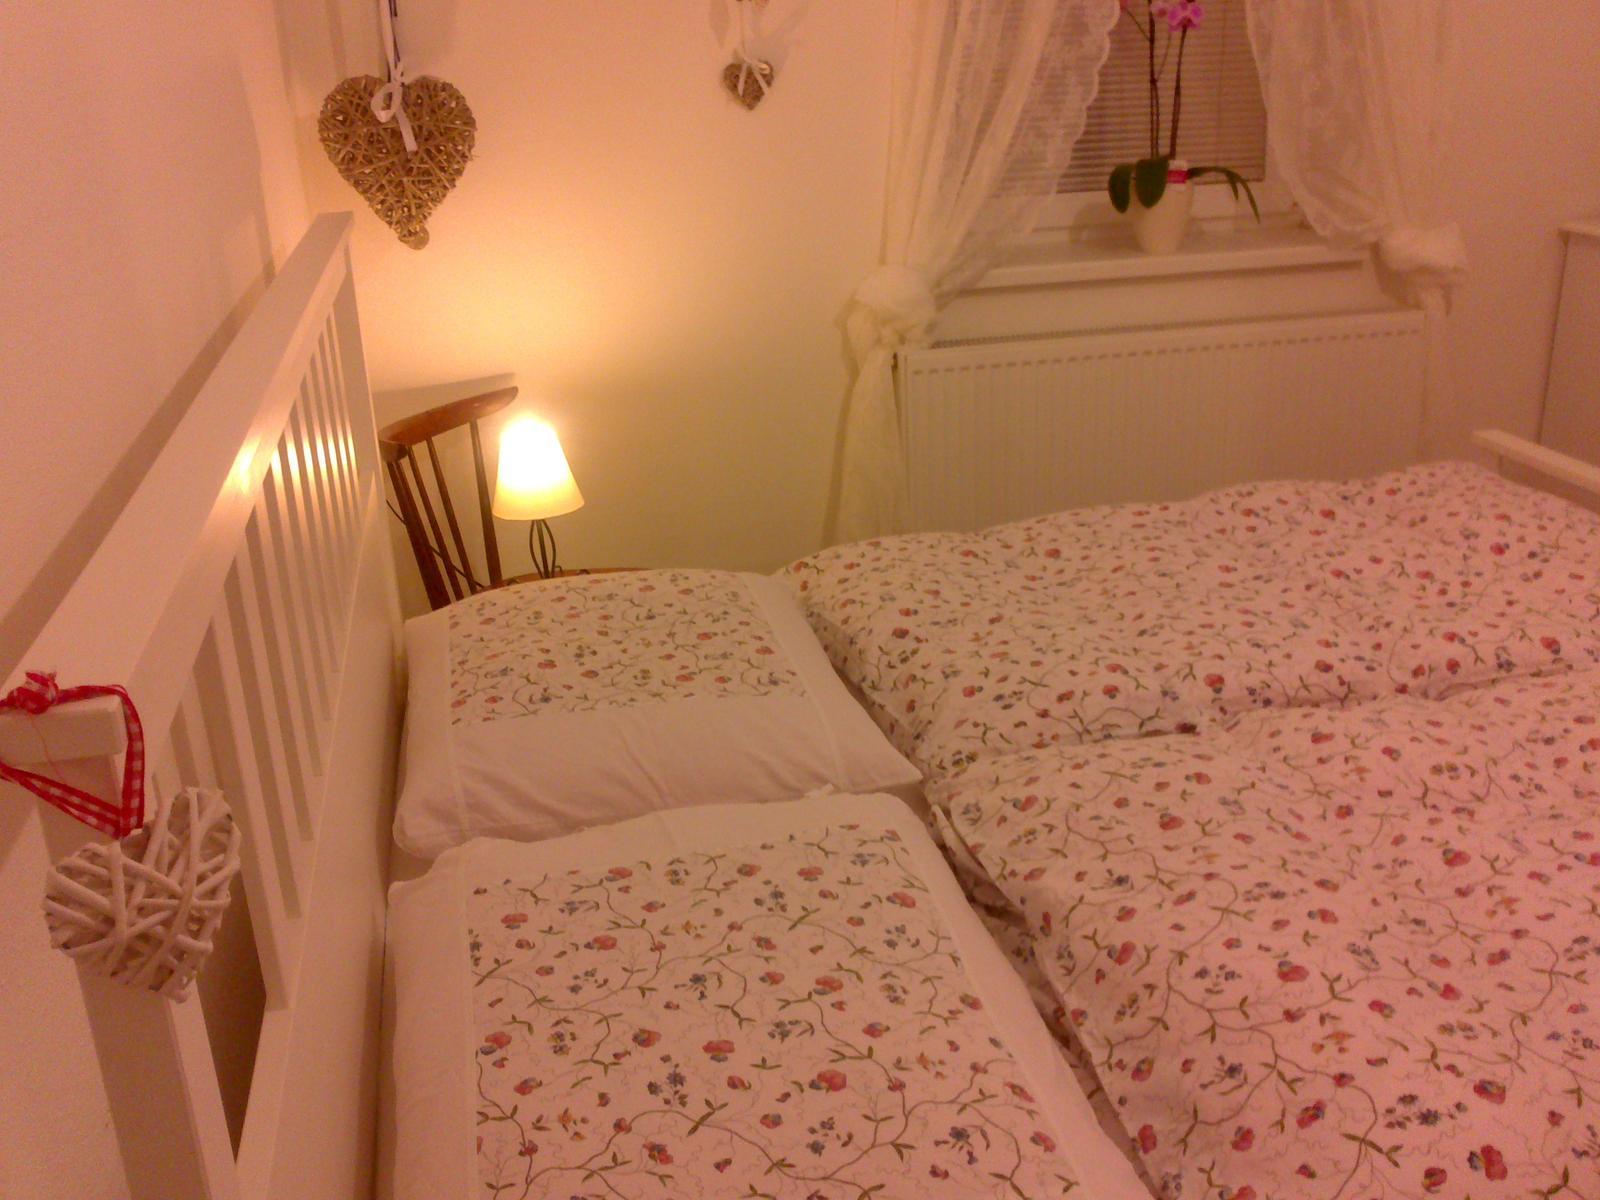 NASE - po 15 rokoch vymena postele :)